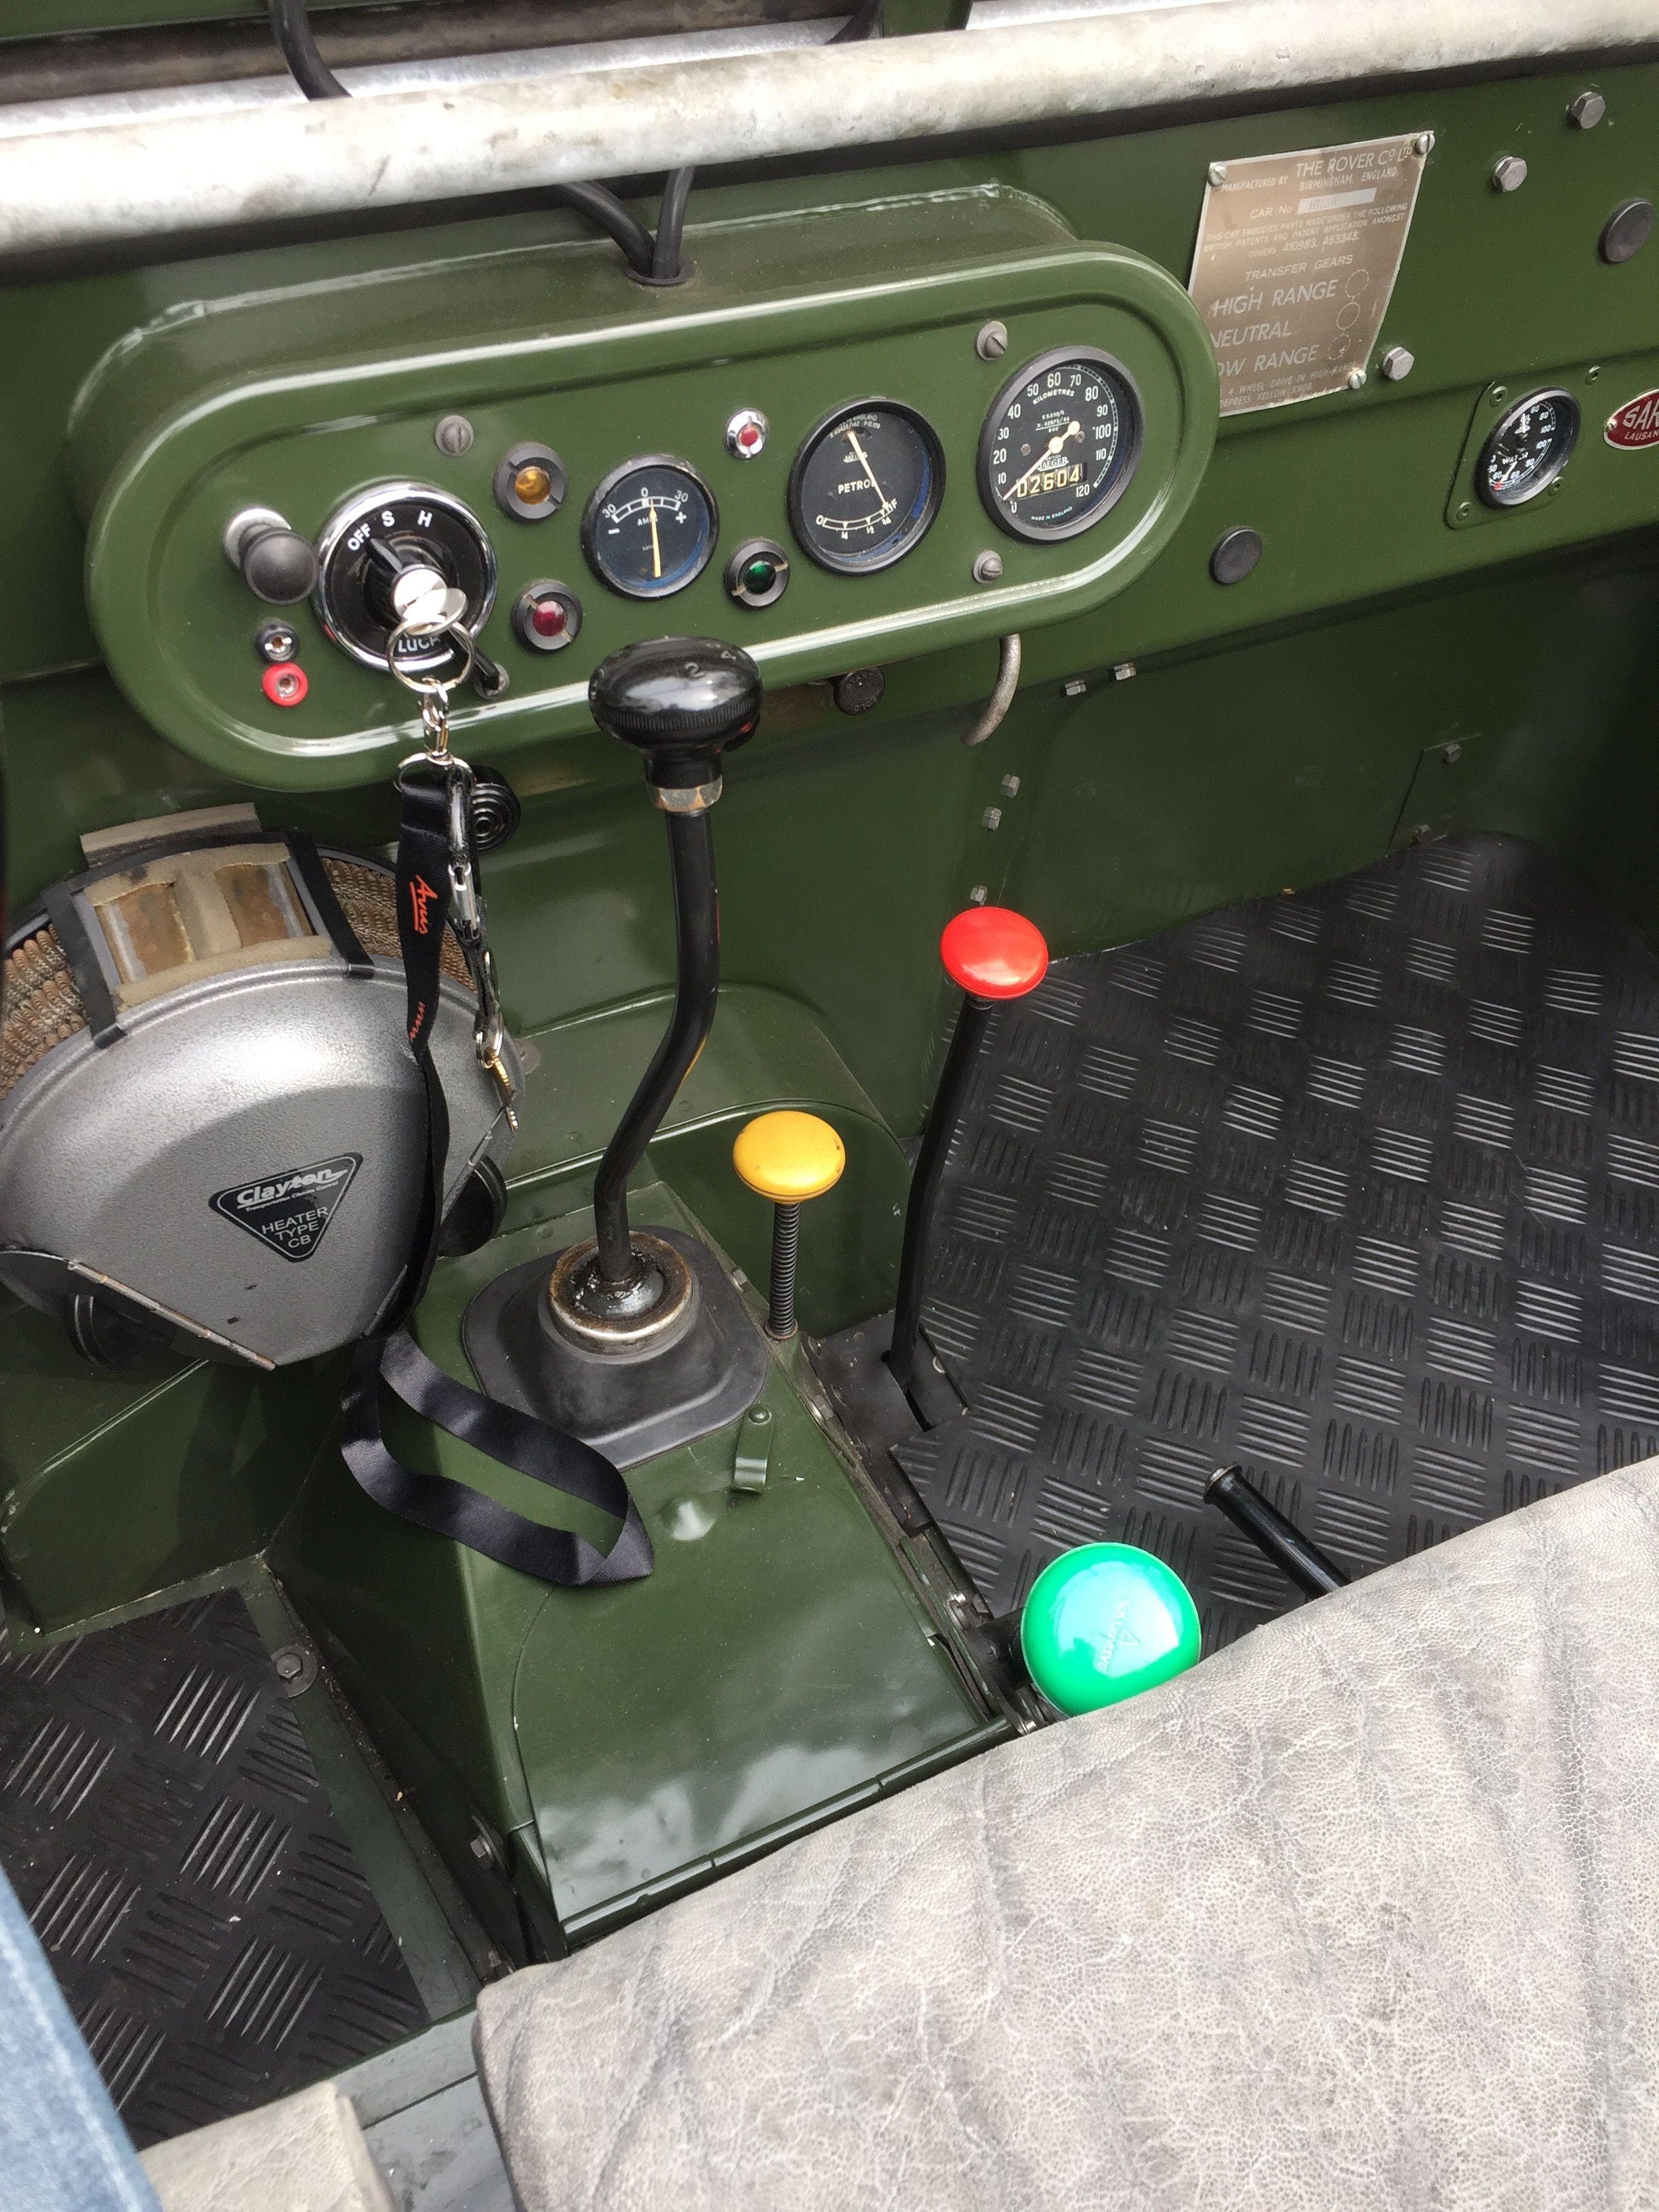 Serie 1 20 10 1951 Detail Gear Shift Green Overdrive Garaje Para Coches Carros Y Camionetas Vehículos Todoterreno